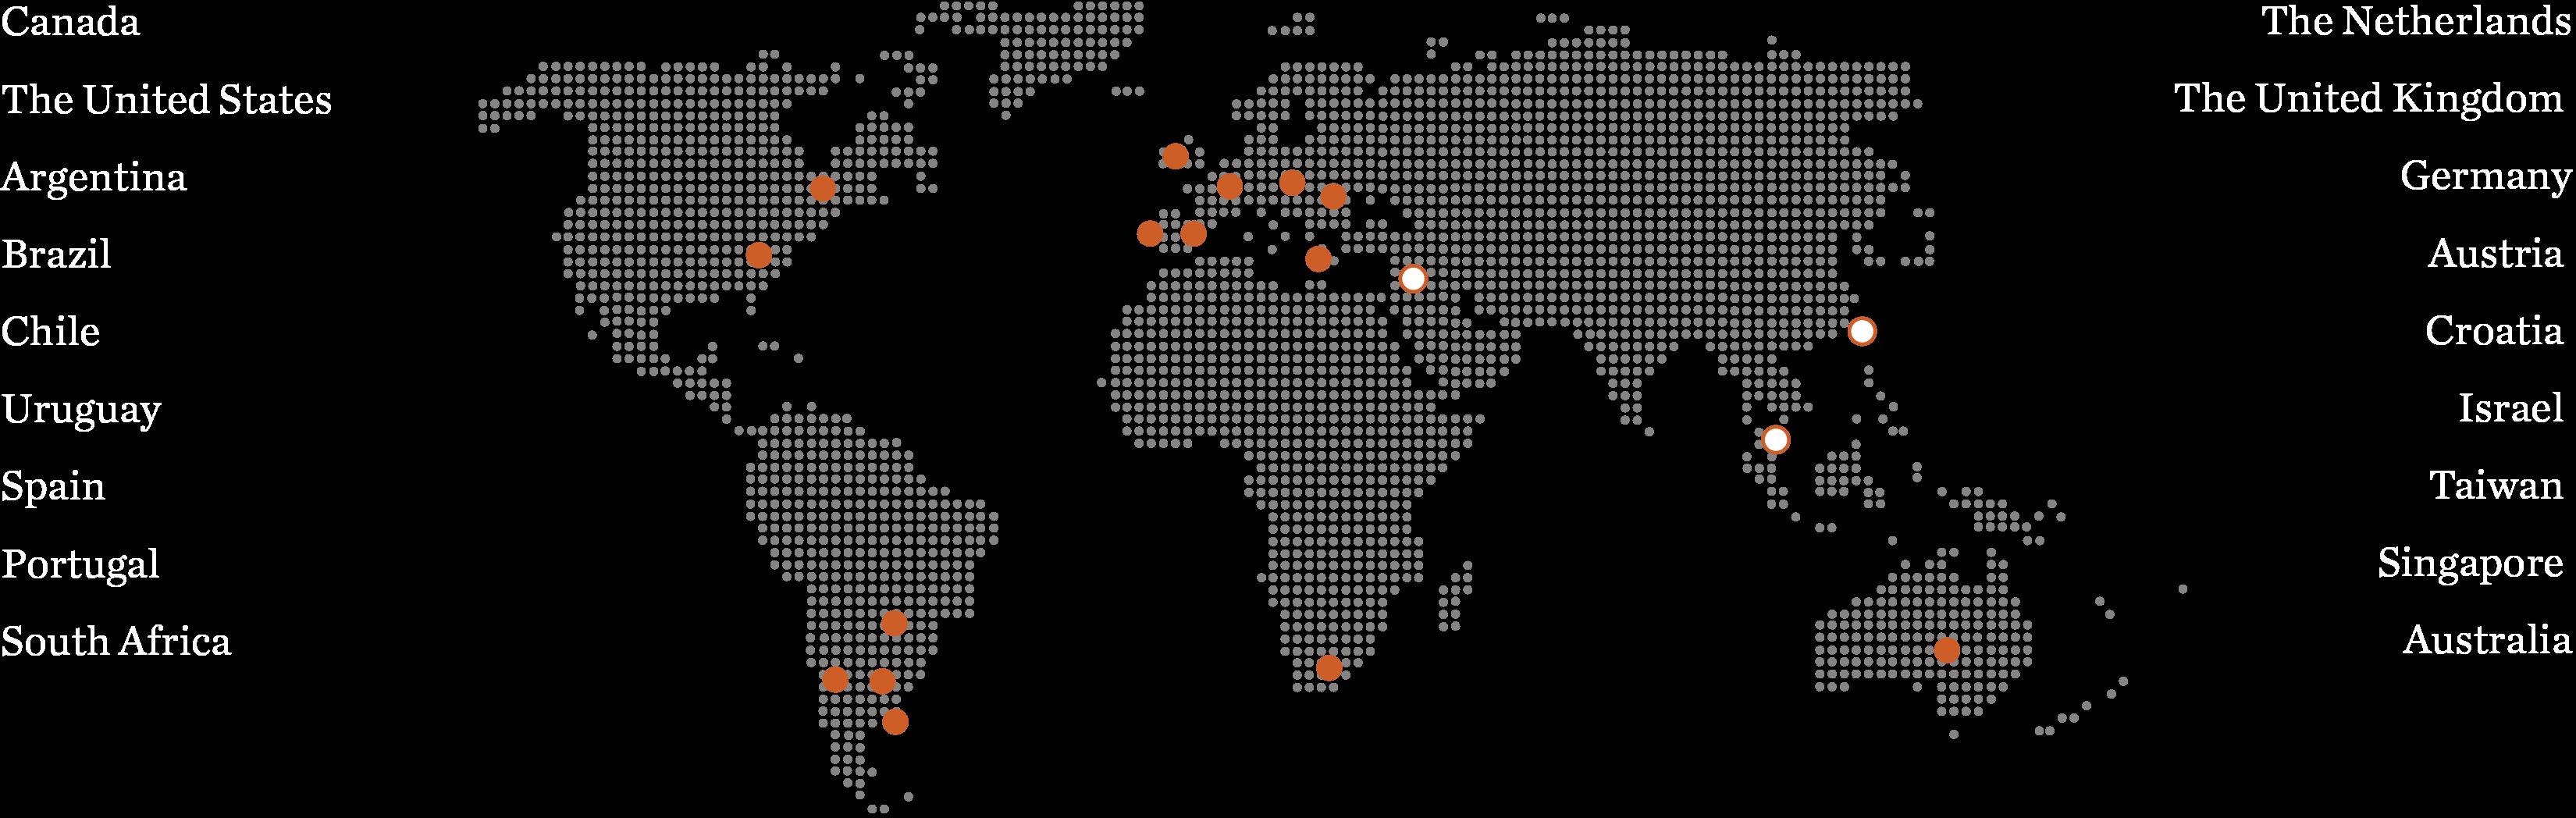 map-landen3300png24-20160321